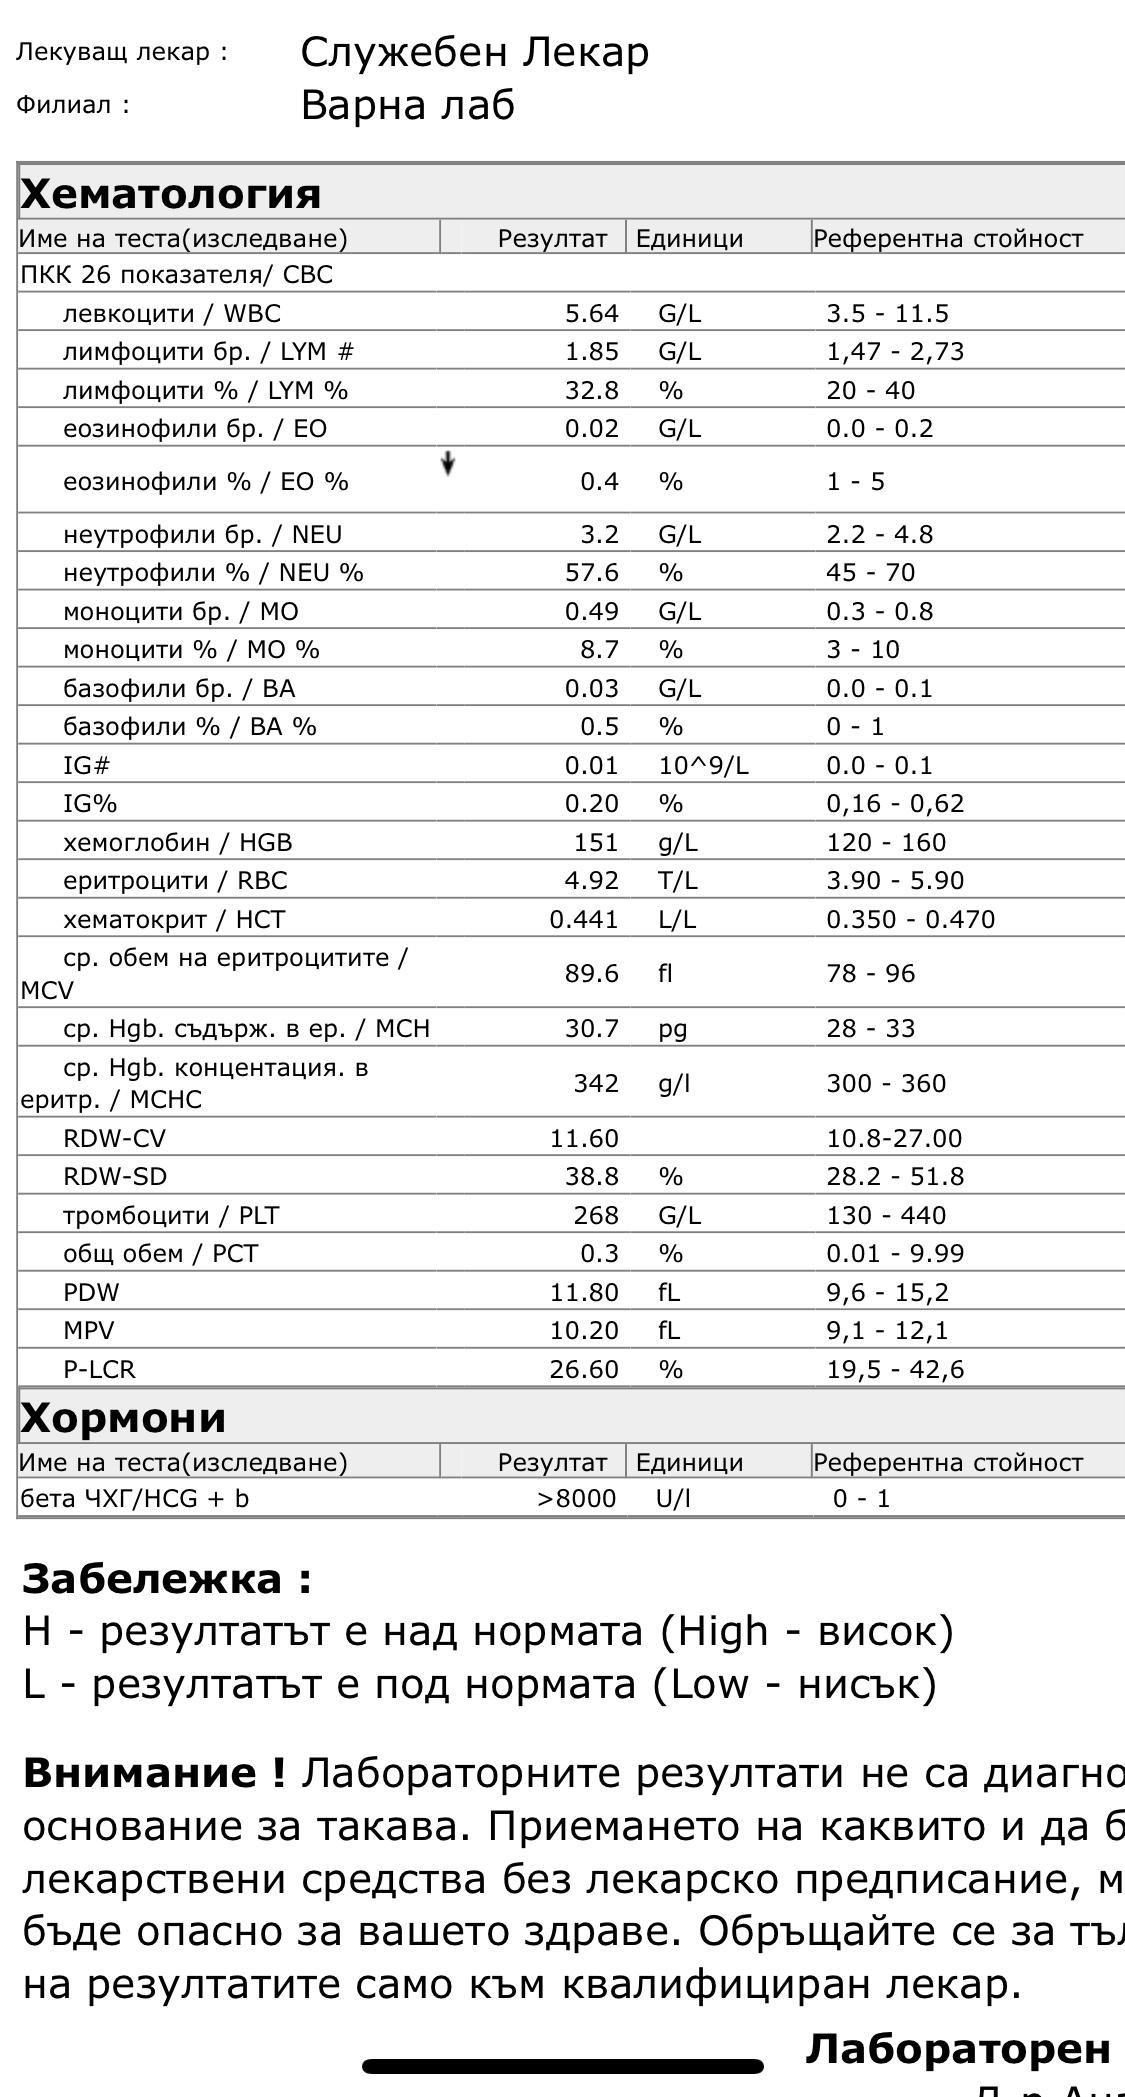 BADC21FF-CCDF-49FA-A3FB-60841964F347.jpeg